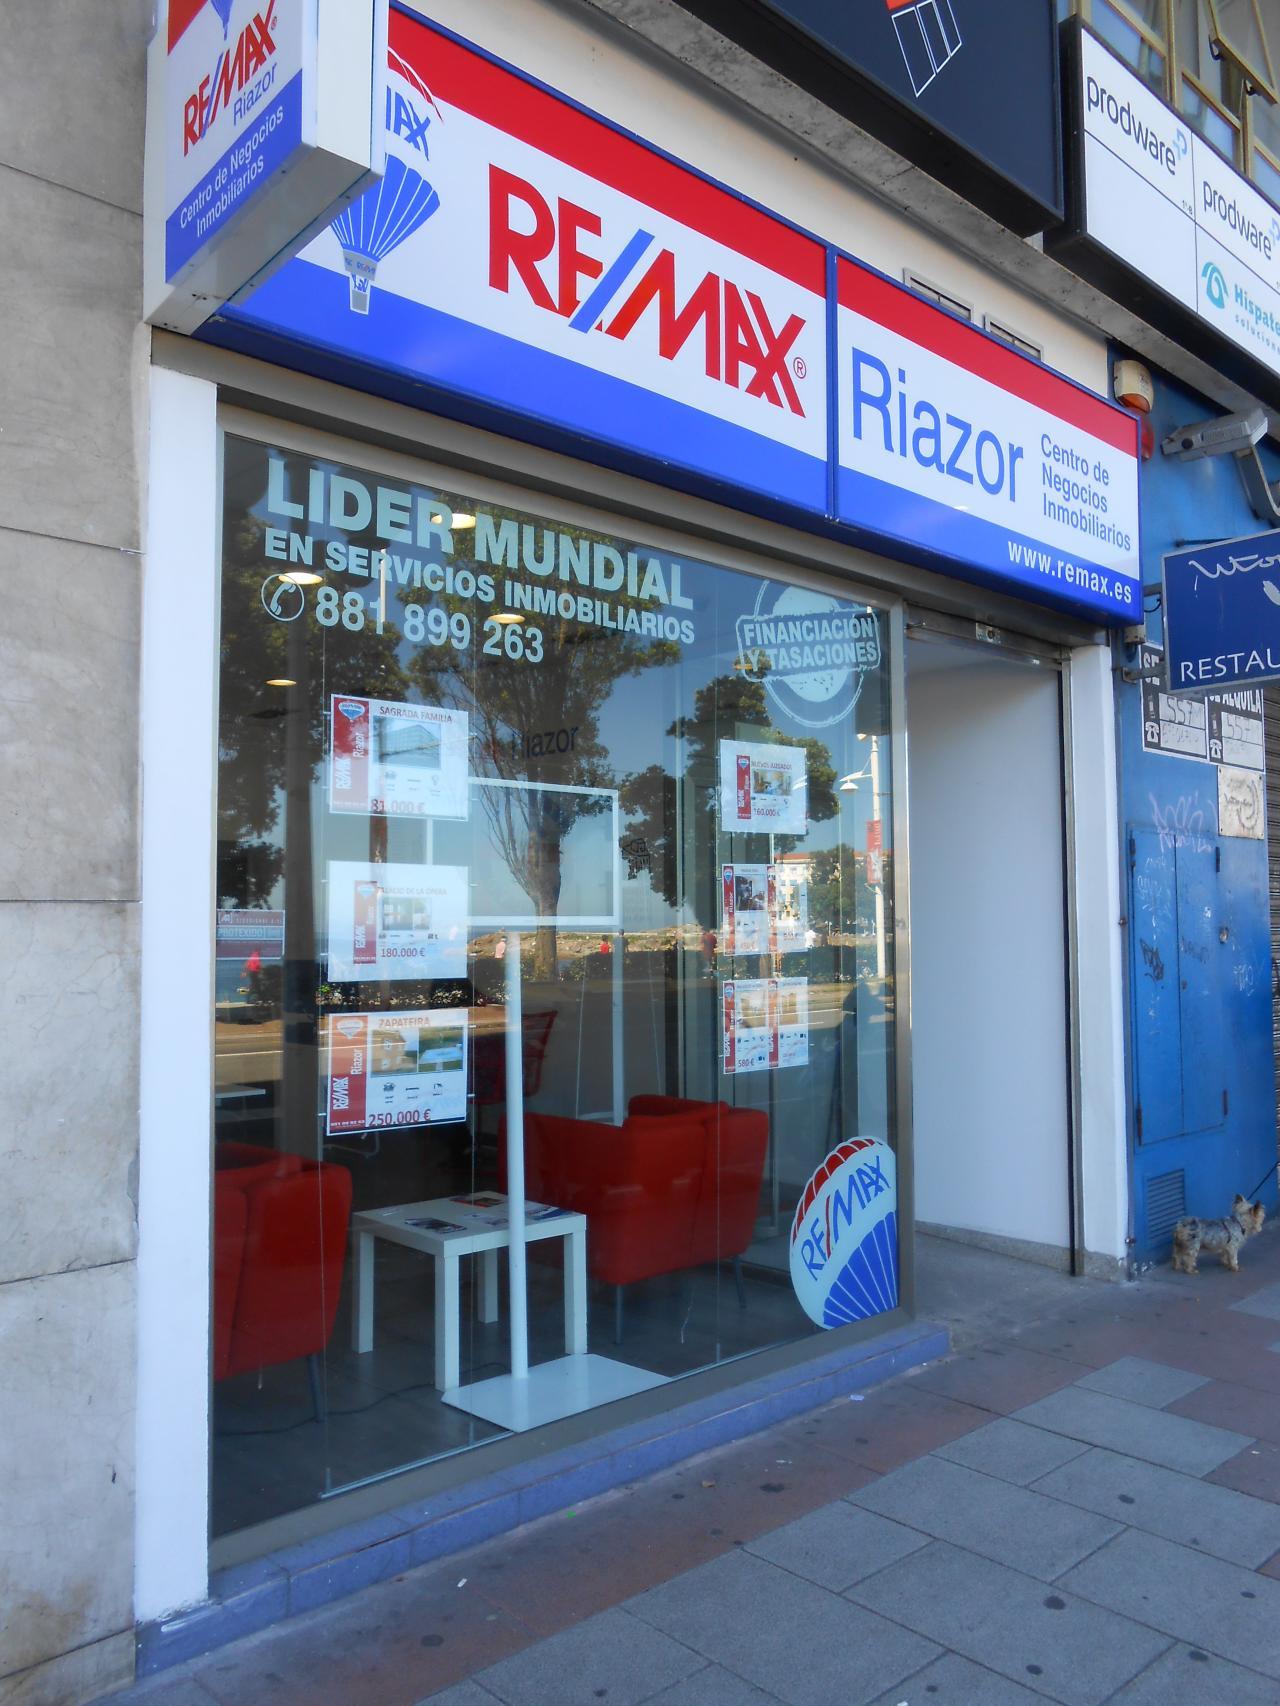 RE/MAX Riazor